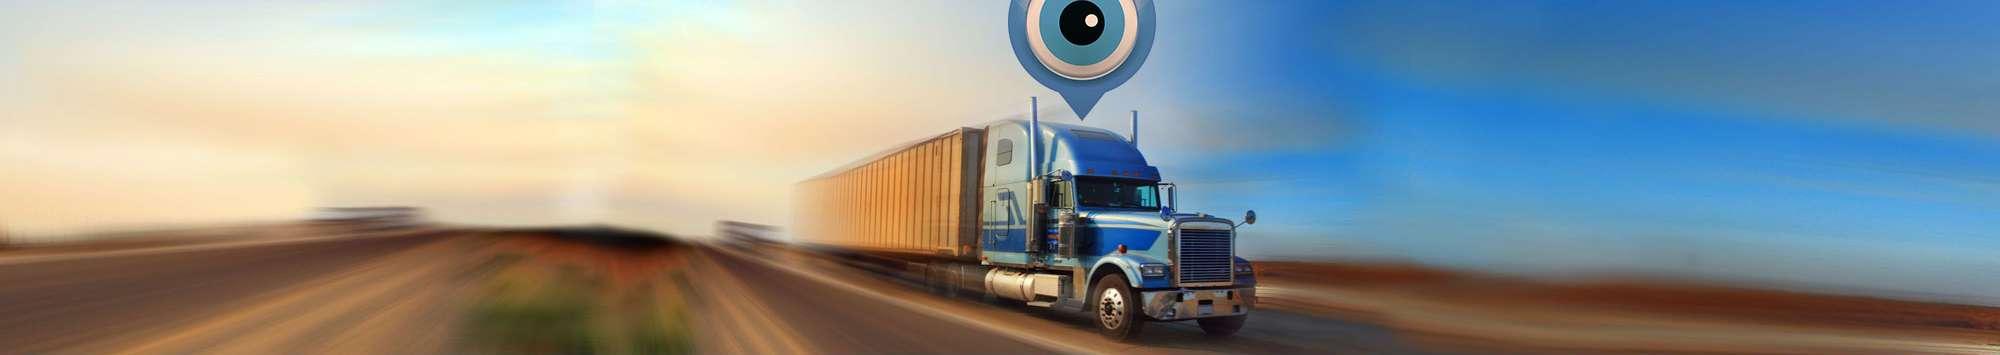 Tracking van voertuigen - auto's - traceersysteem auto